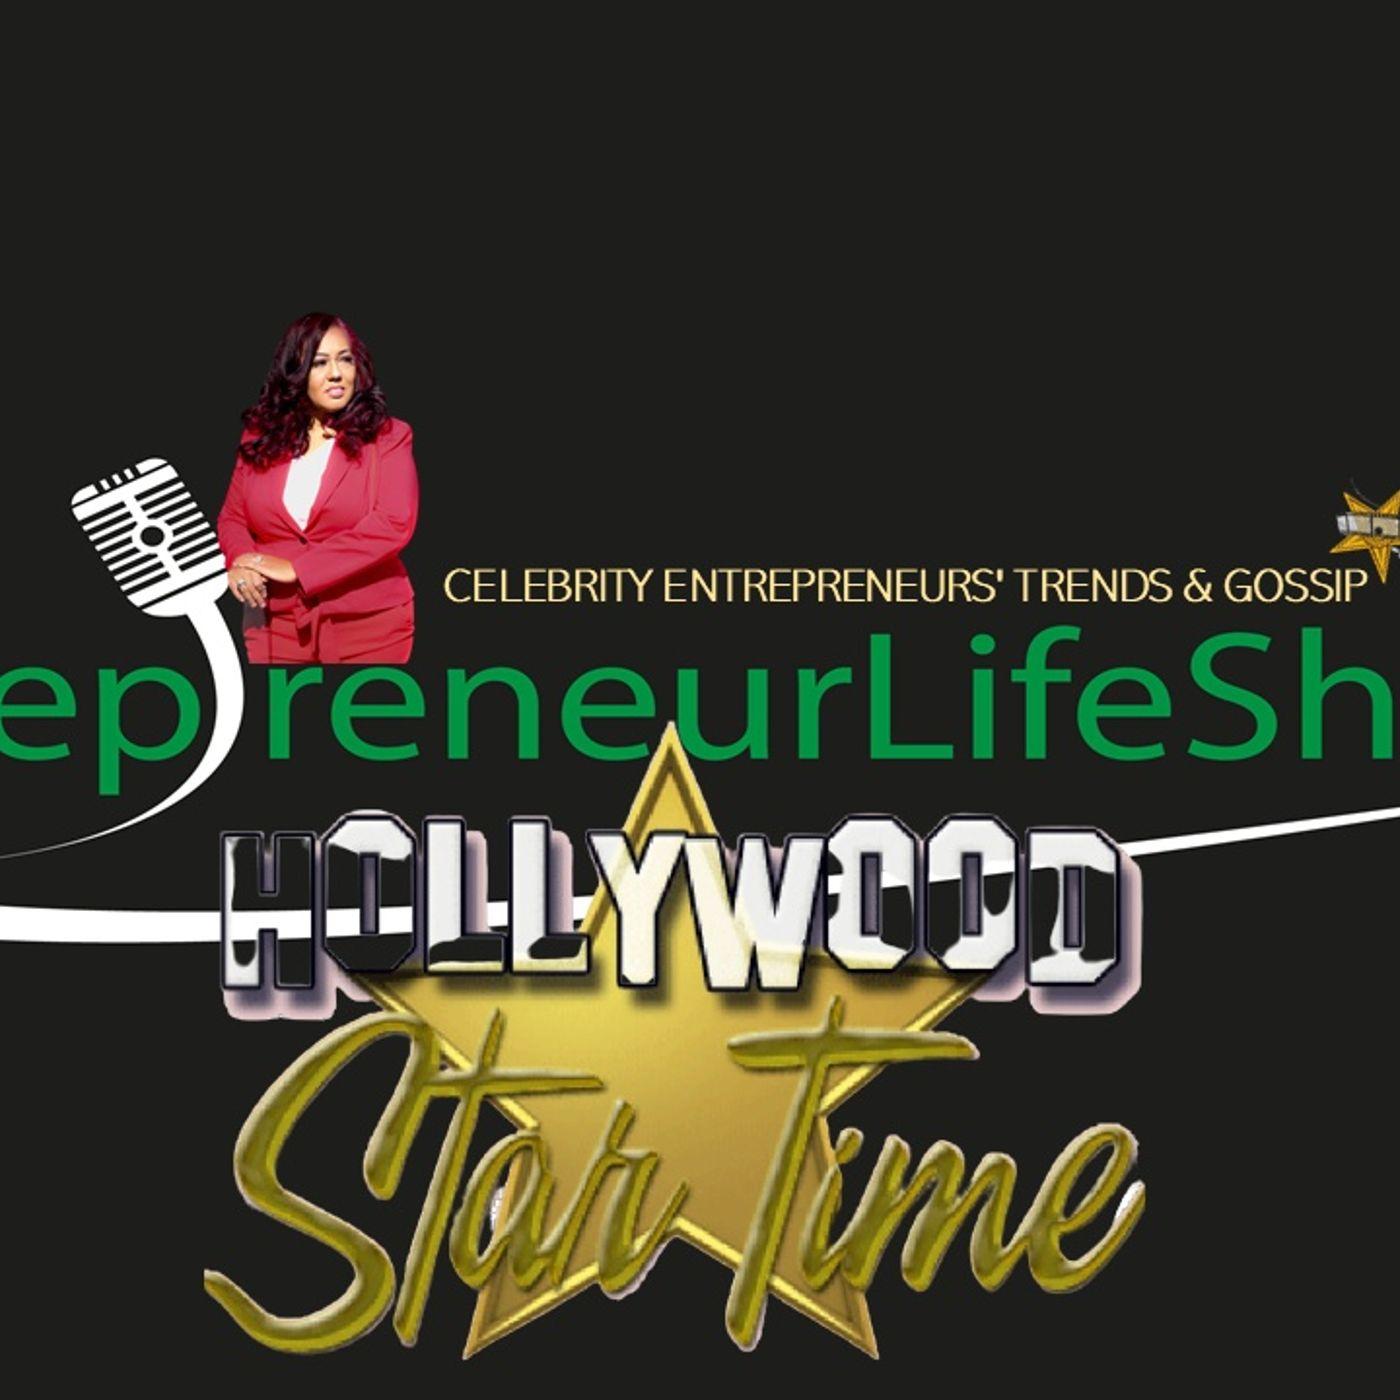 Celebrity Entrepreneurs TRENDS & GOSSIP